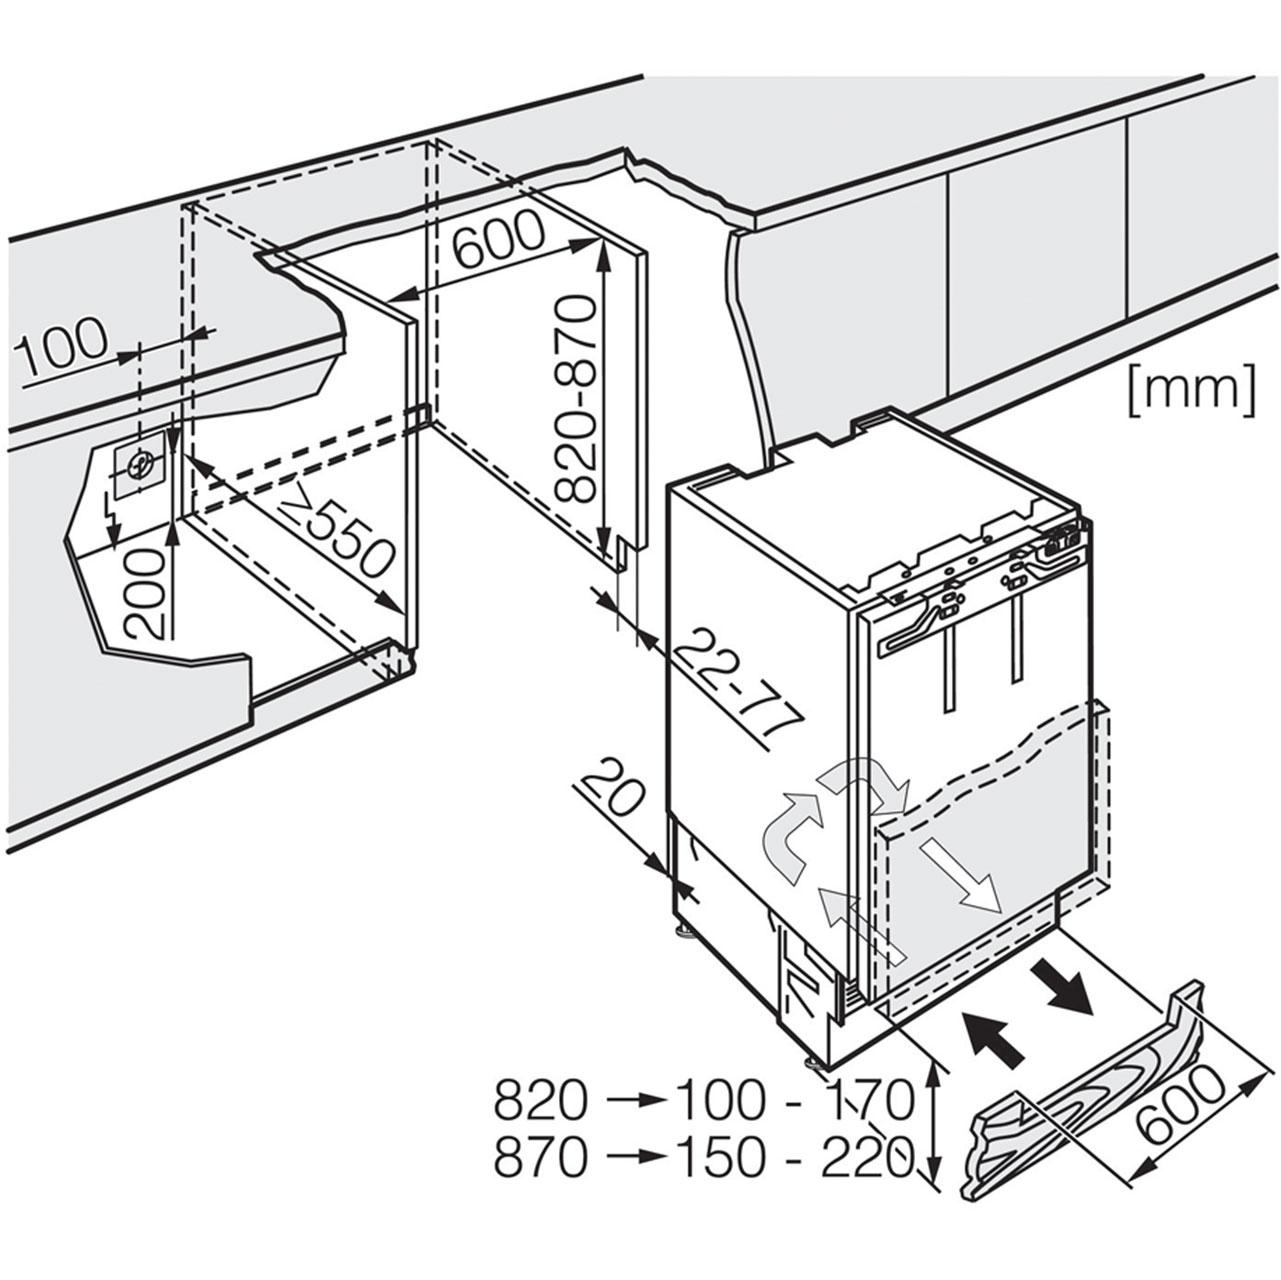 Freezer Drawing At Getdrawings